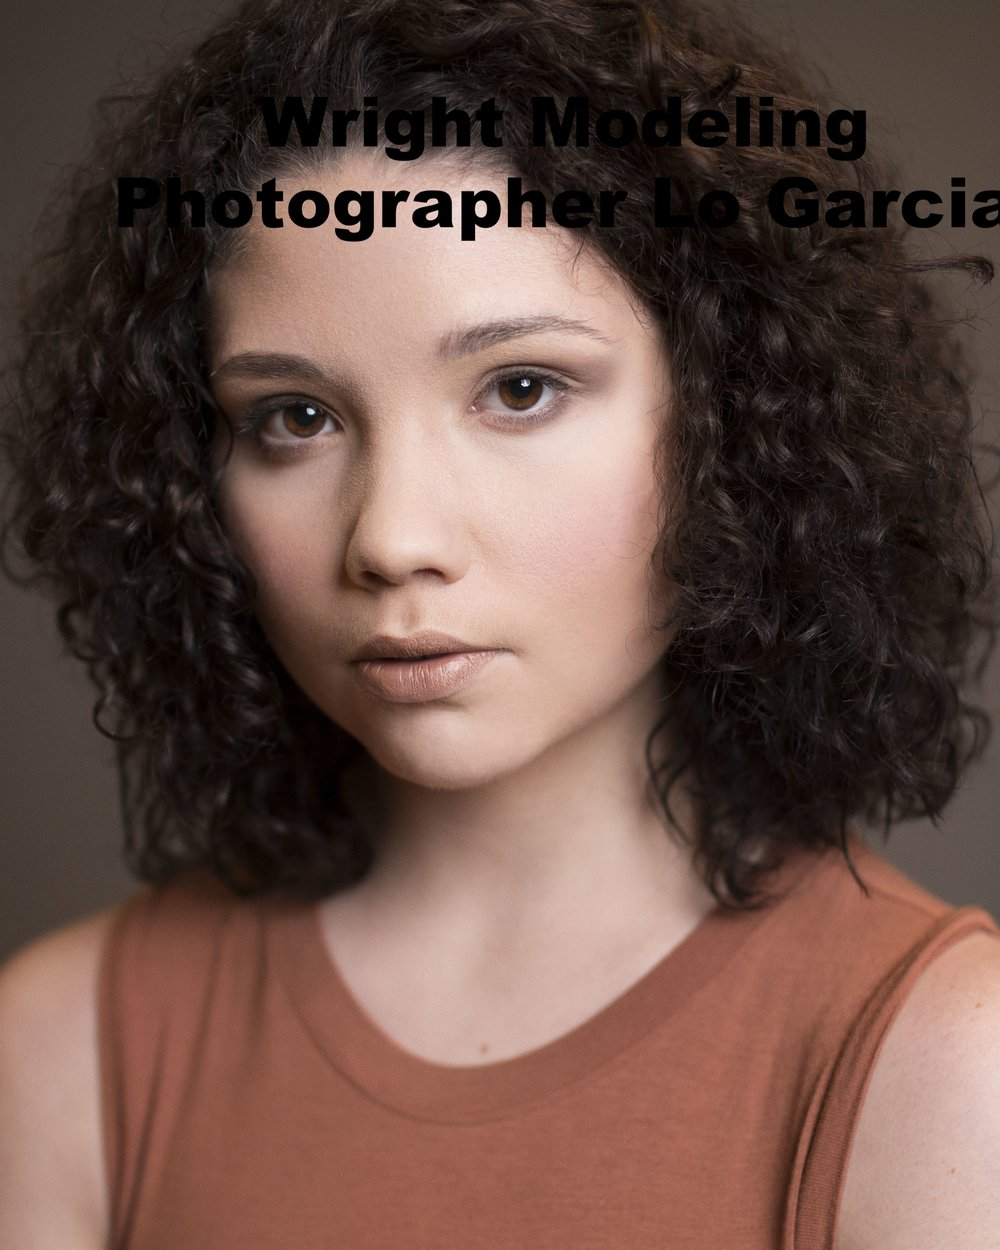 Photographer:Lo Garcia  Model: Jazmyne  Wright Modeling Agency